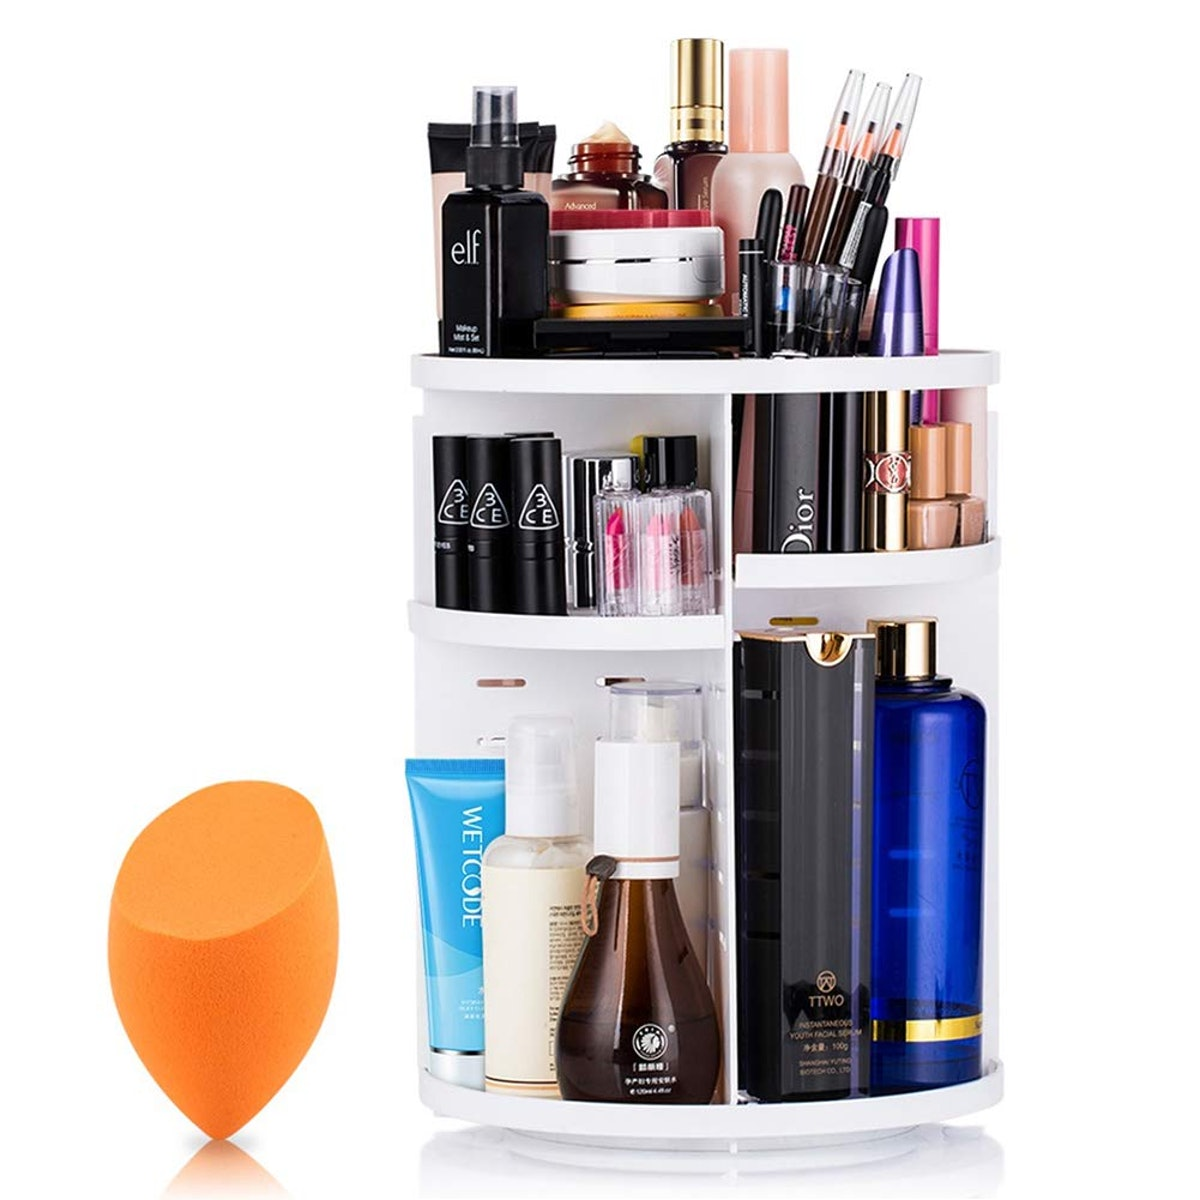 360-Degree Rotating Makeup Organizer